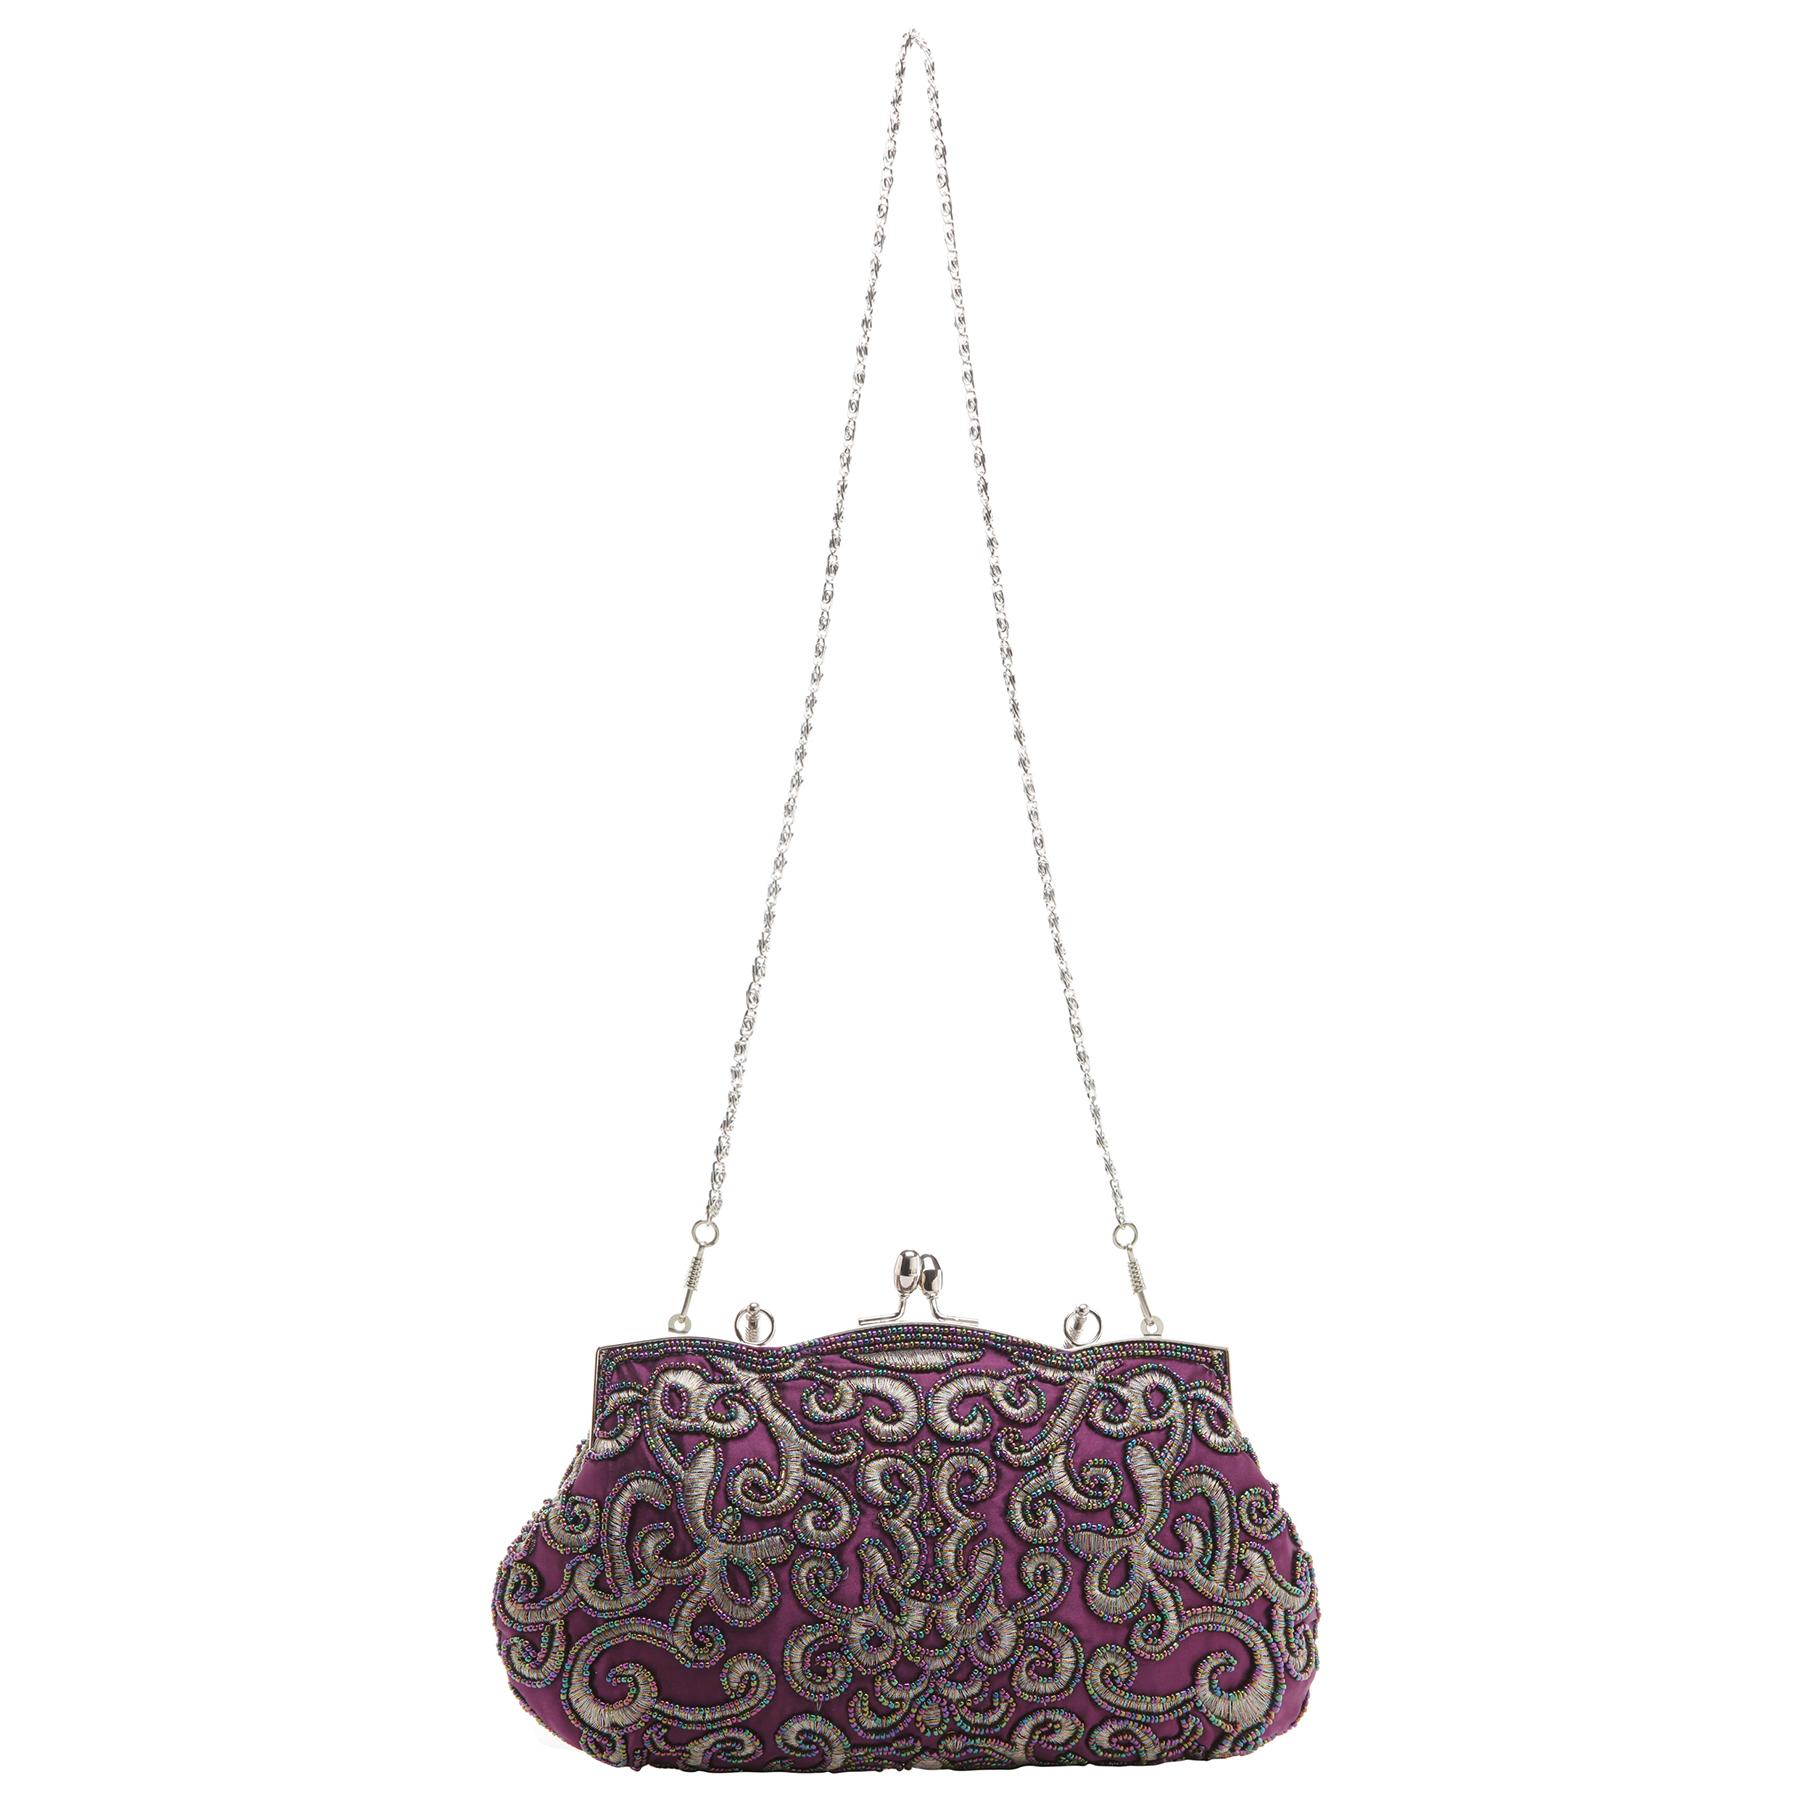 ADELE Purple Embroidered Evening Bag strap